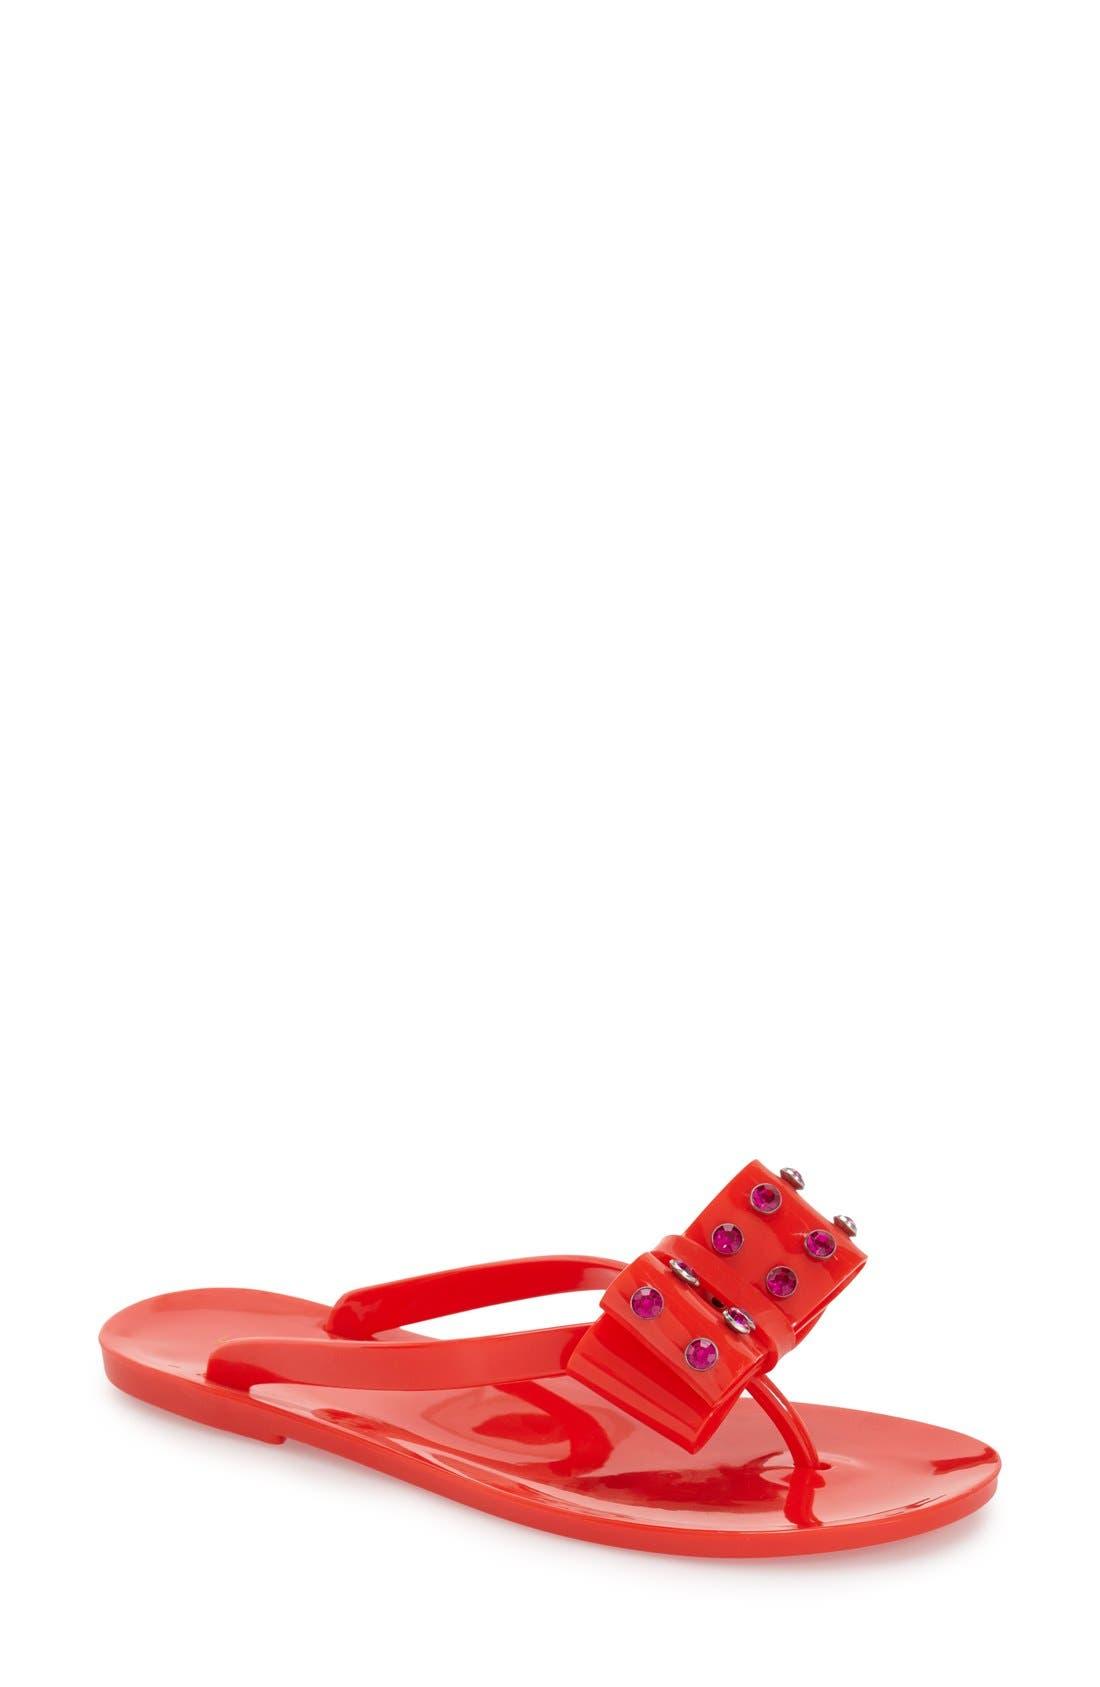 Alternate Image 1 Selected - kate spade new york 'francy' crystal bow flip flop (Women)